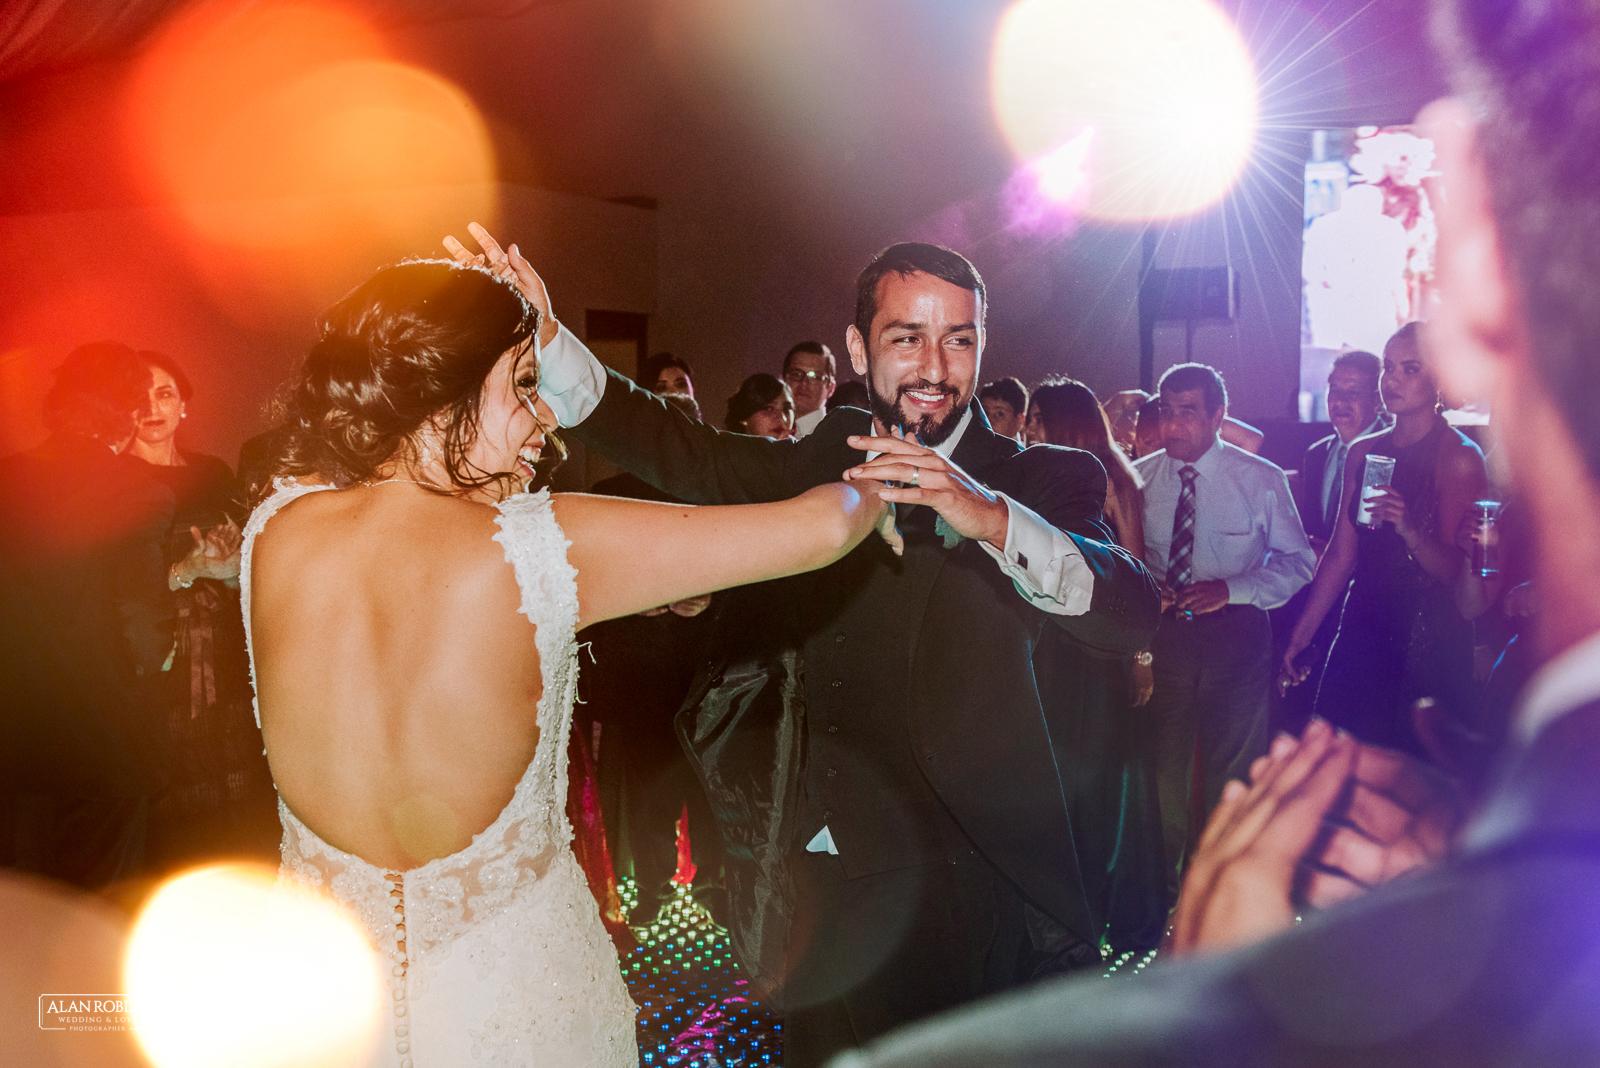 Fotografo de bodas Alan Robles-Boda en Guadalajara Real San Javier-61